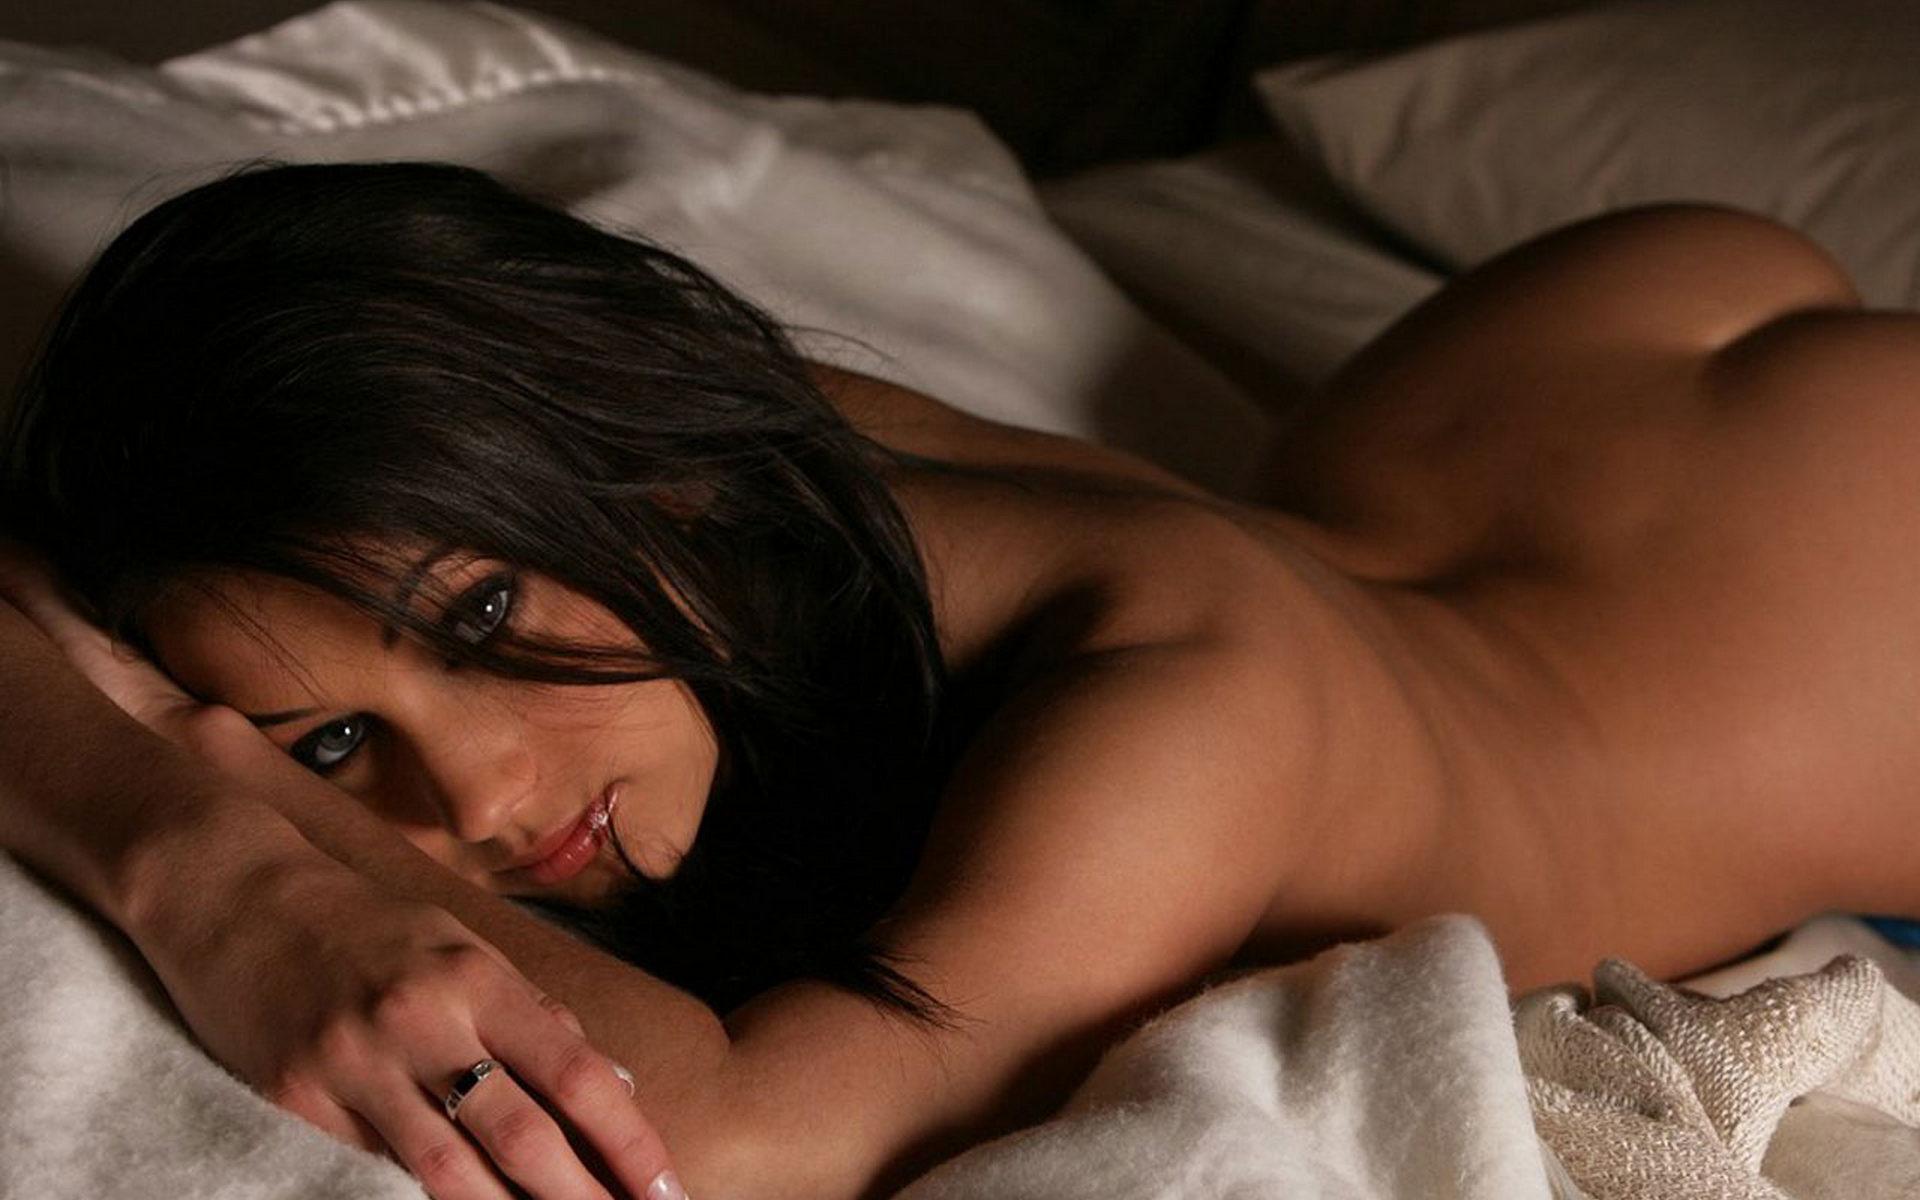 Фото галереи секса брюнеток 10 фотография